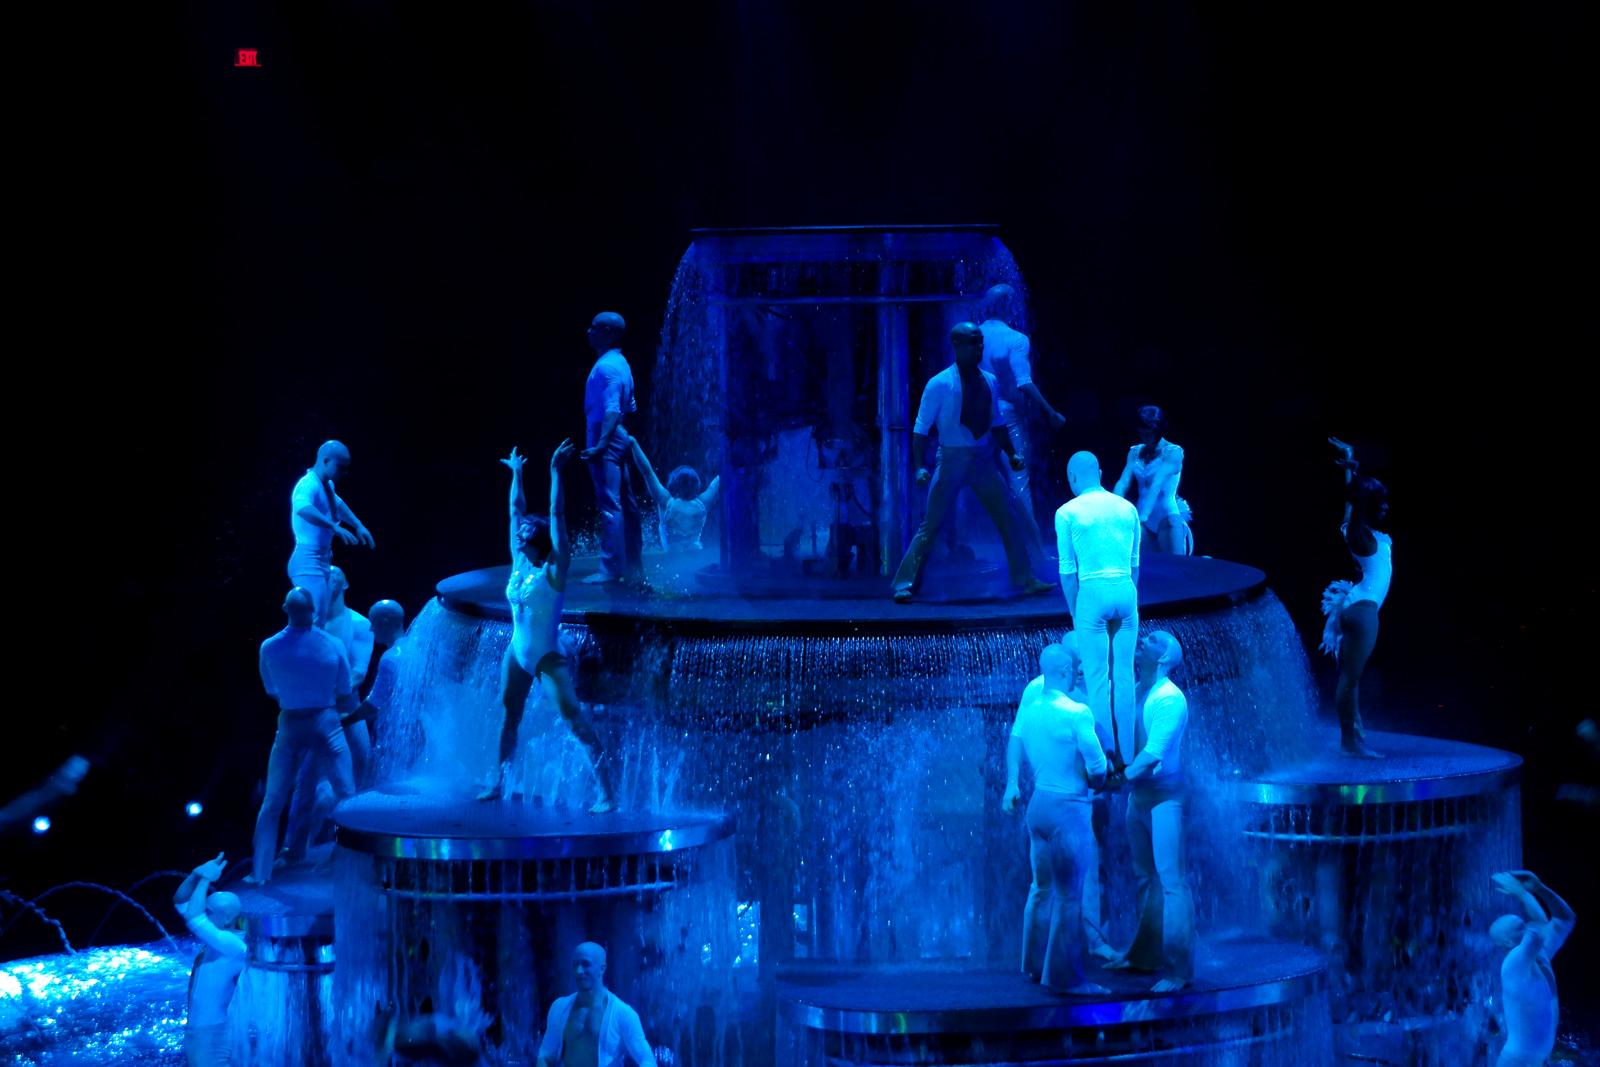 Le Rêve - The Dream @ Wynn Las Vegas : 10 ans de show Dragone ! -